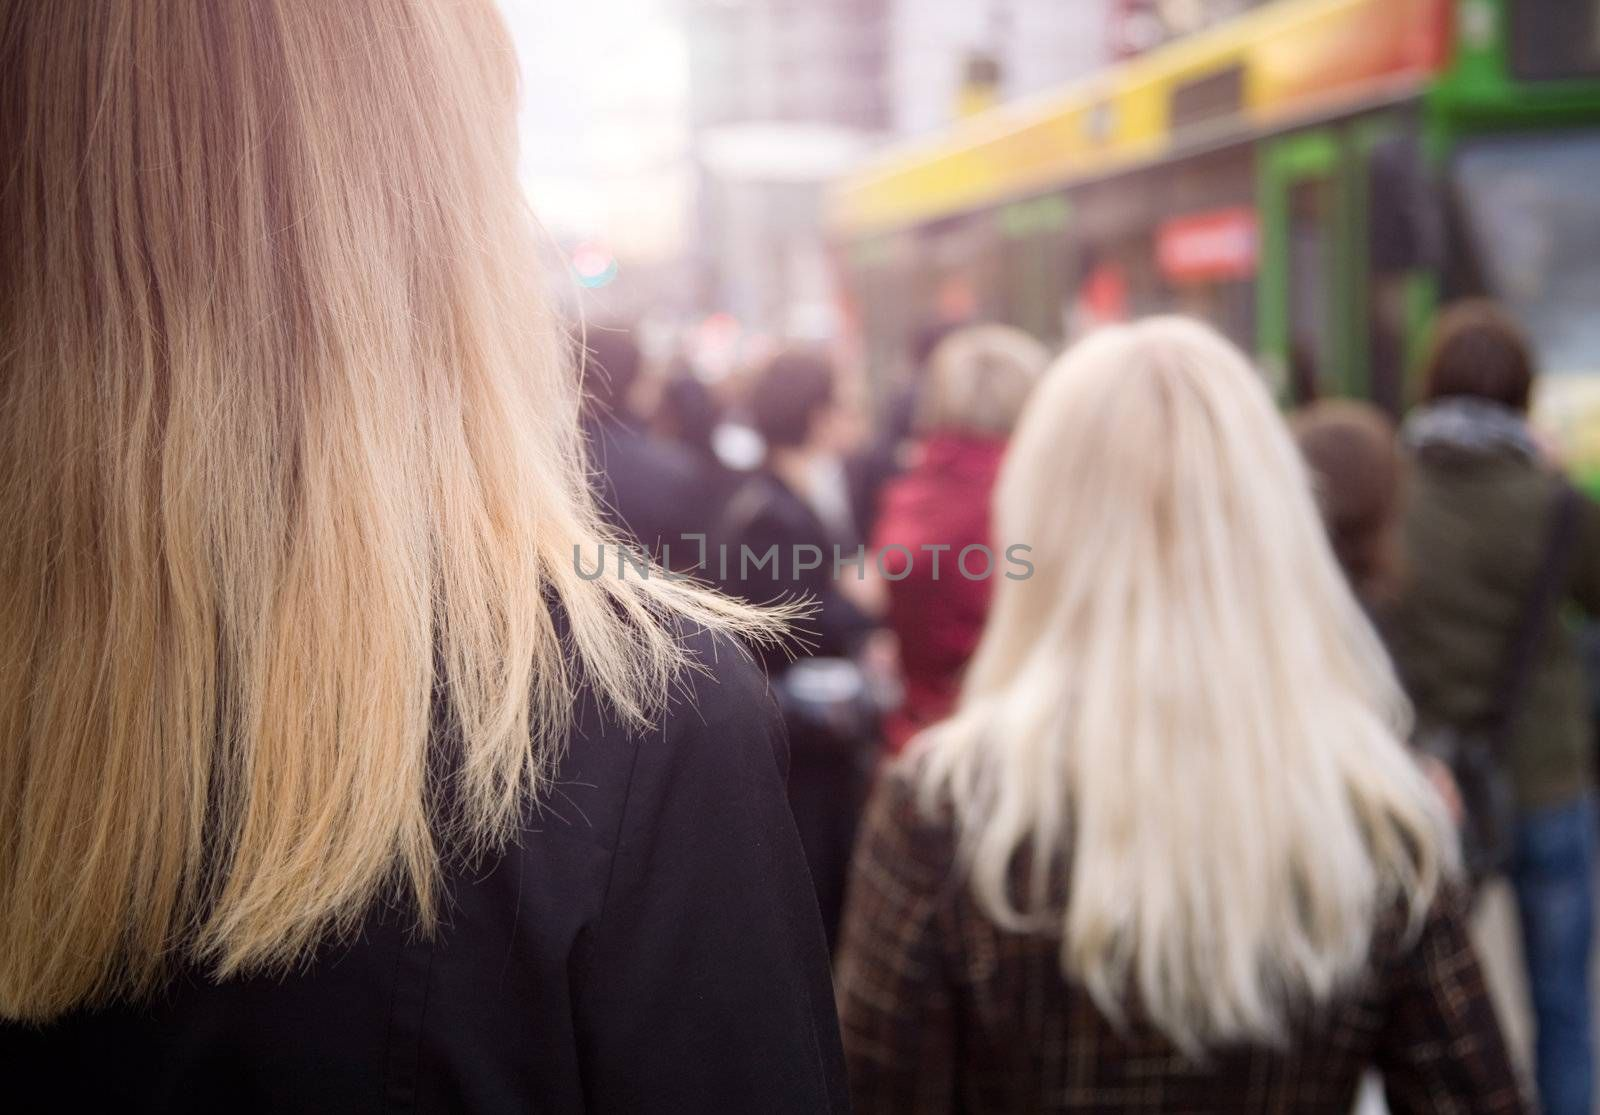 urban citizen concept, focus point on left side( nearest woman)